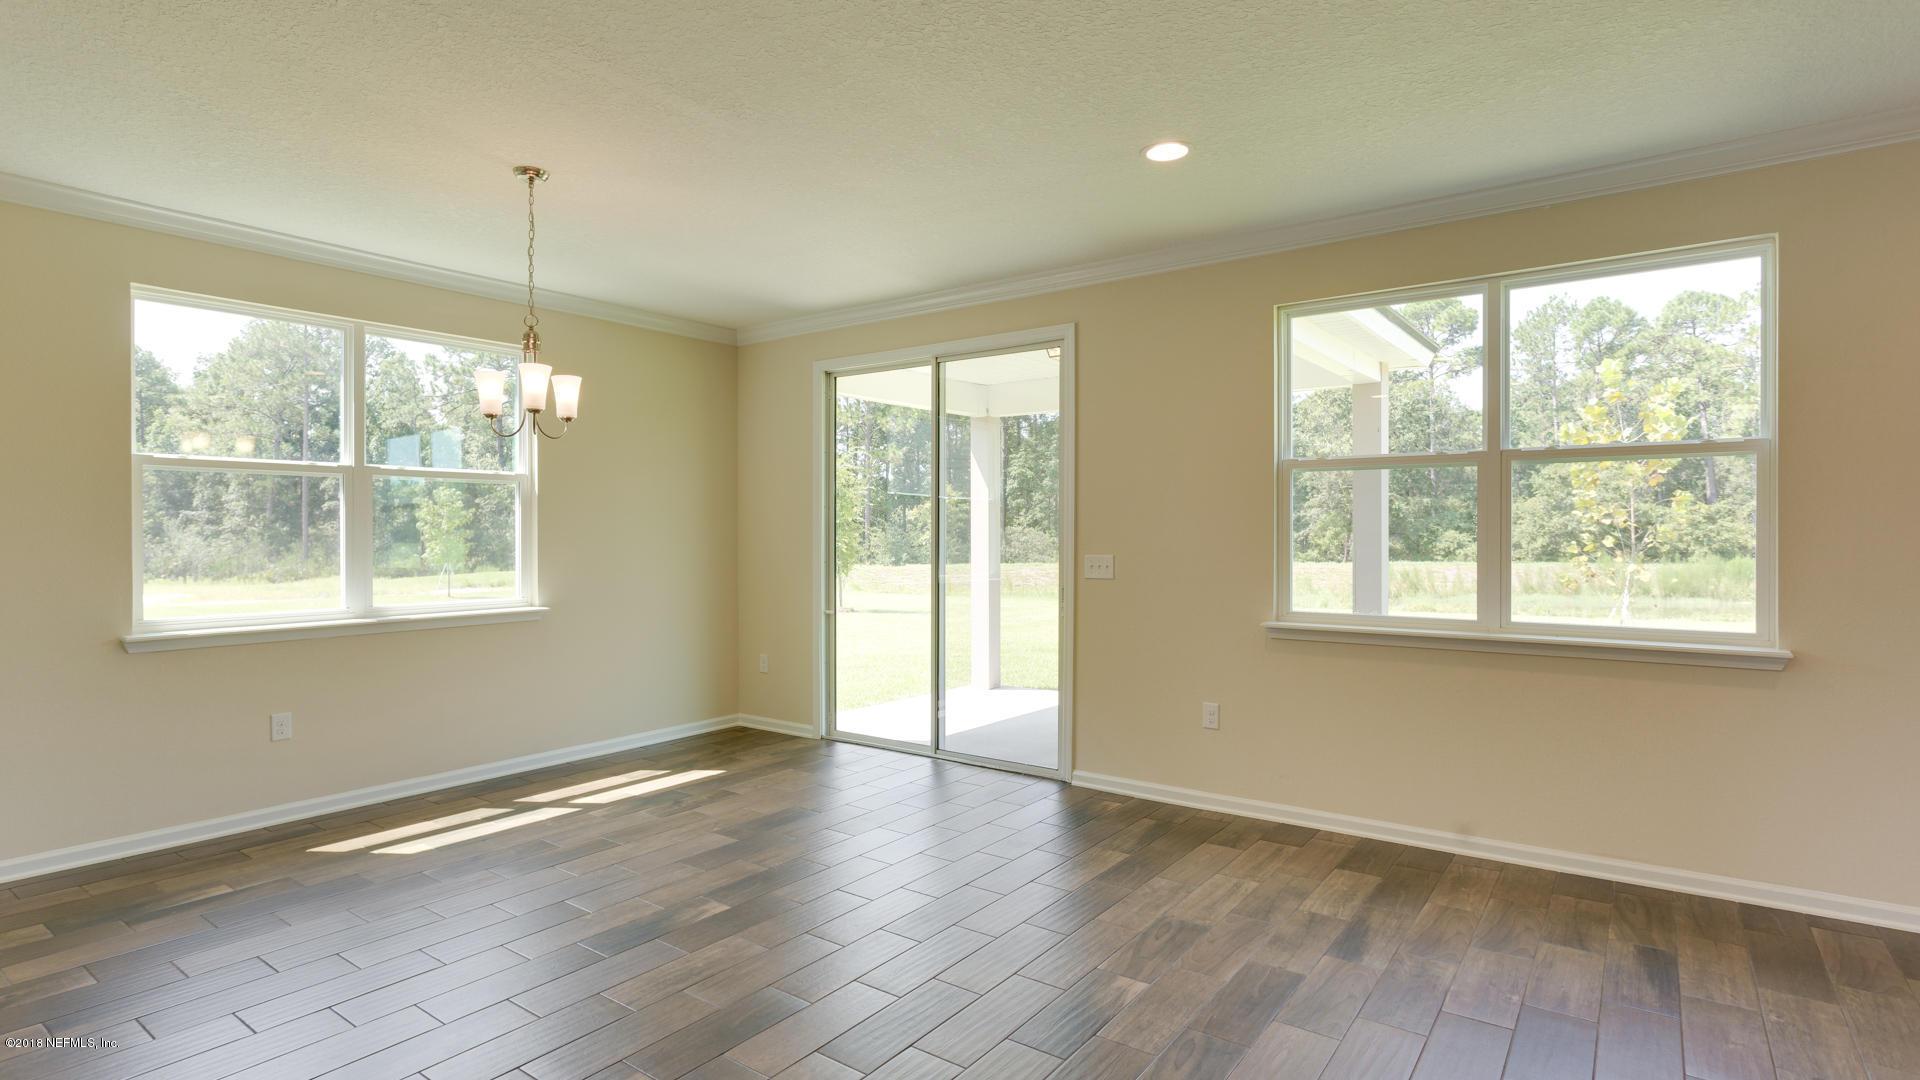 4171 FISHING CREEK, MIDDLEBURG, FLORIDA 32068, 4 Bedrooms Bedrooms, ,2 BathroomsBathrooms,Residential - single family,For sale,FISHING CREEK,943946